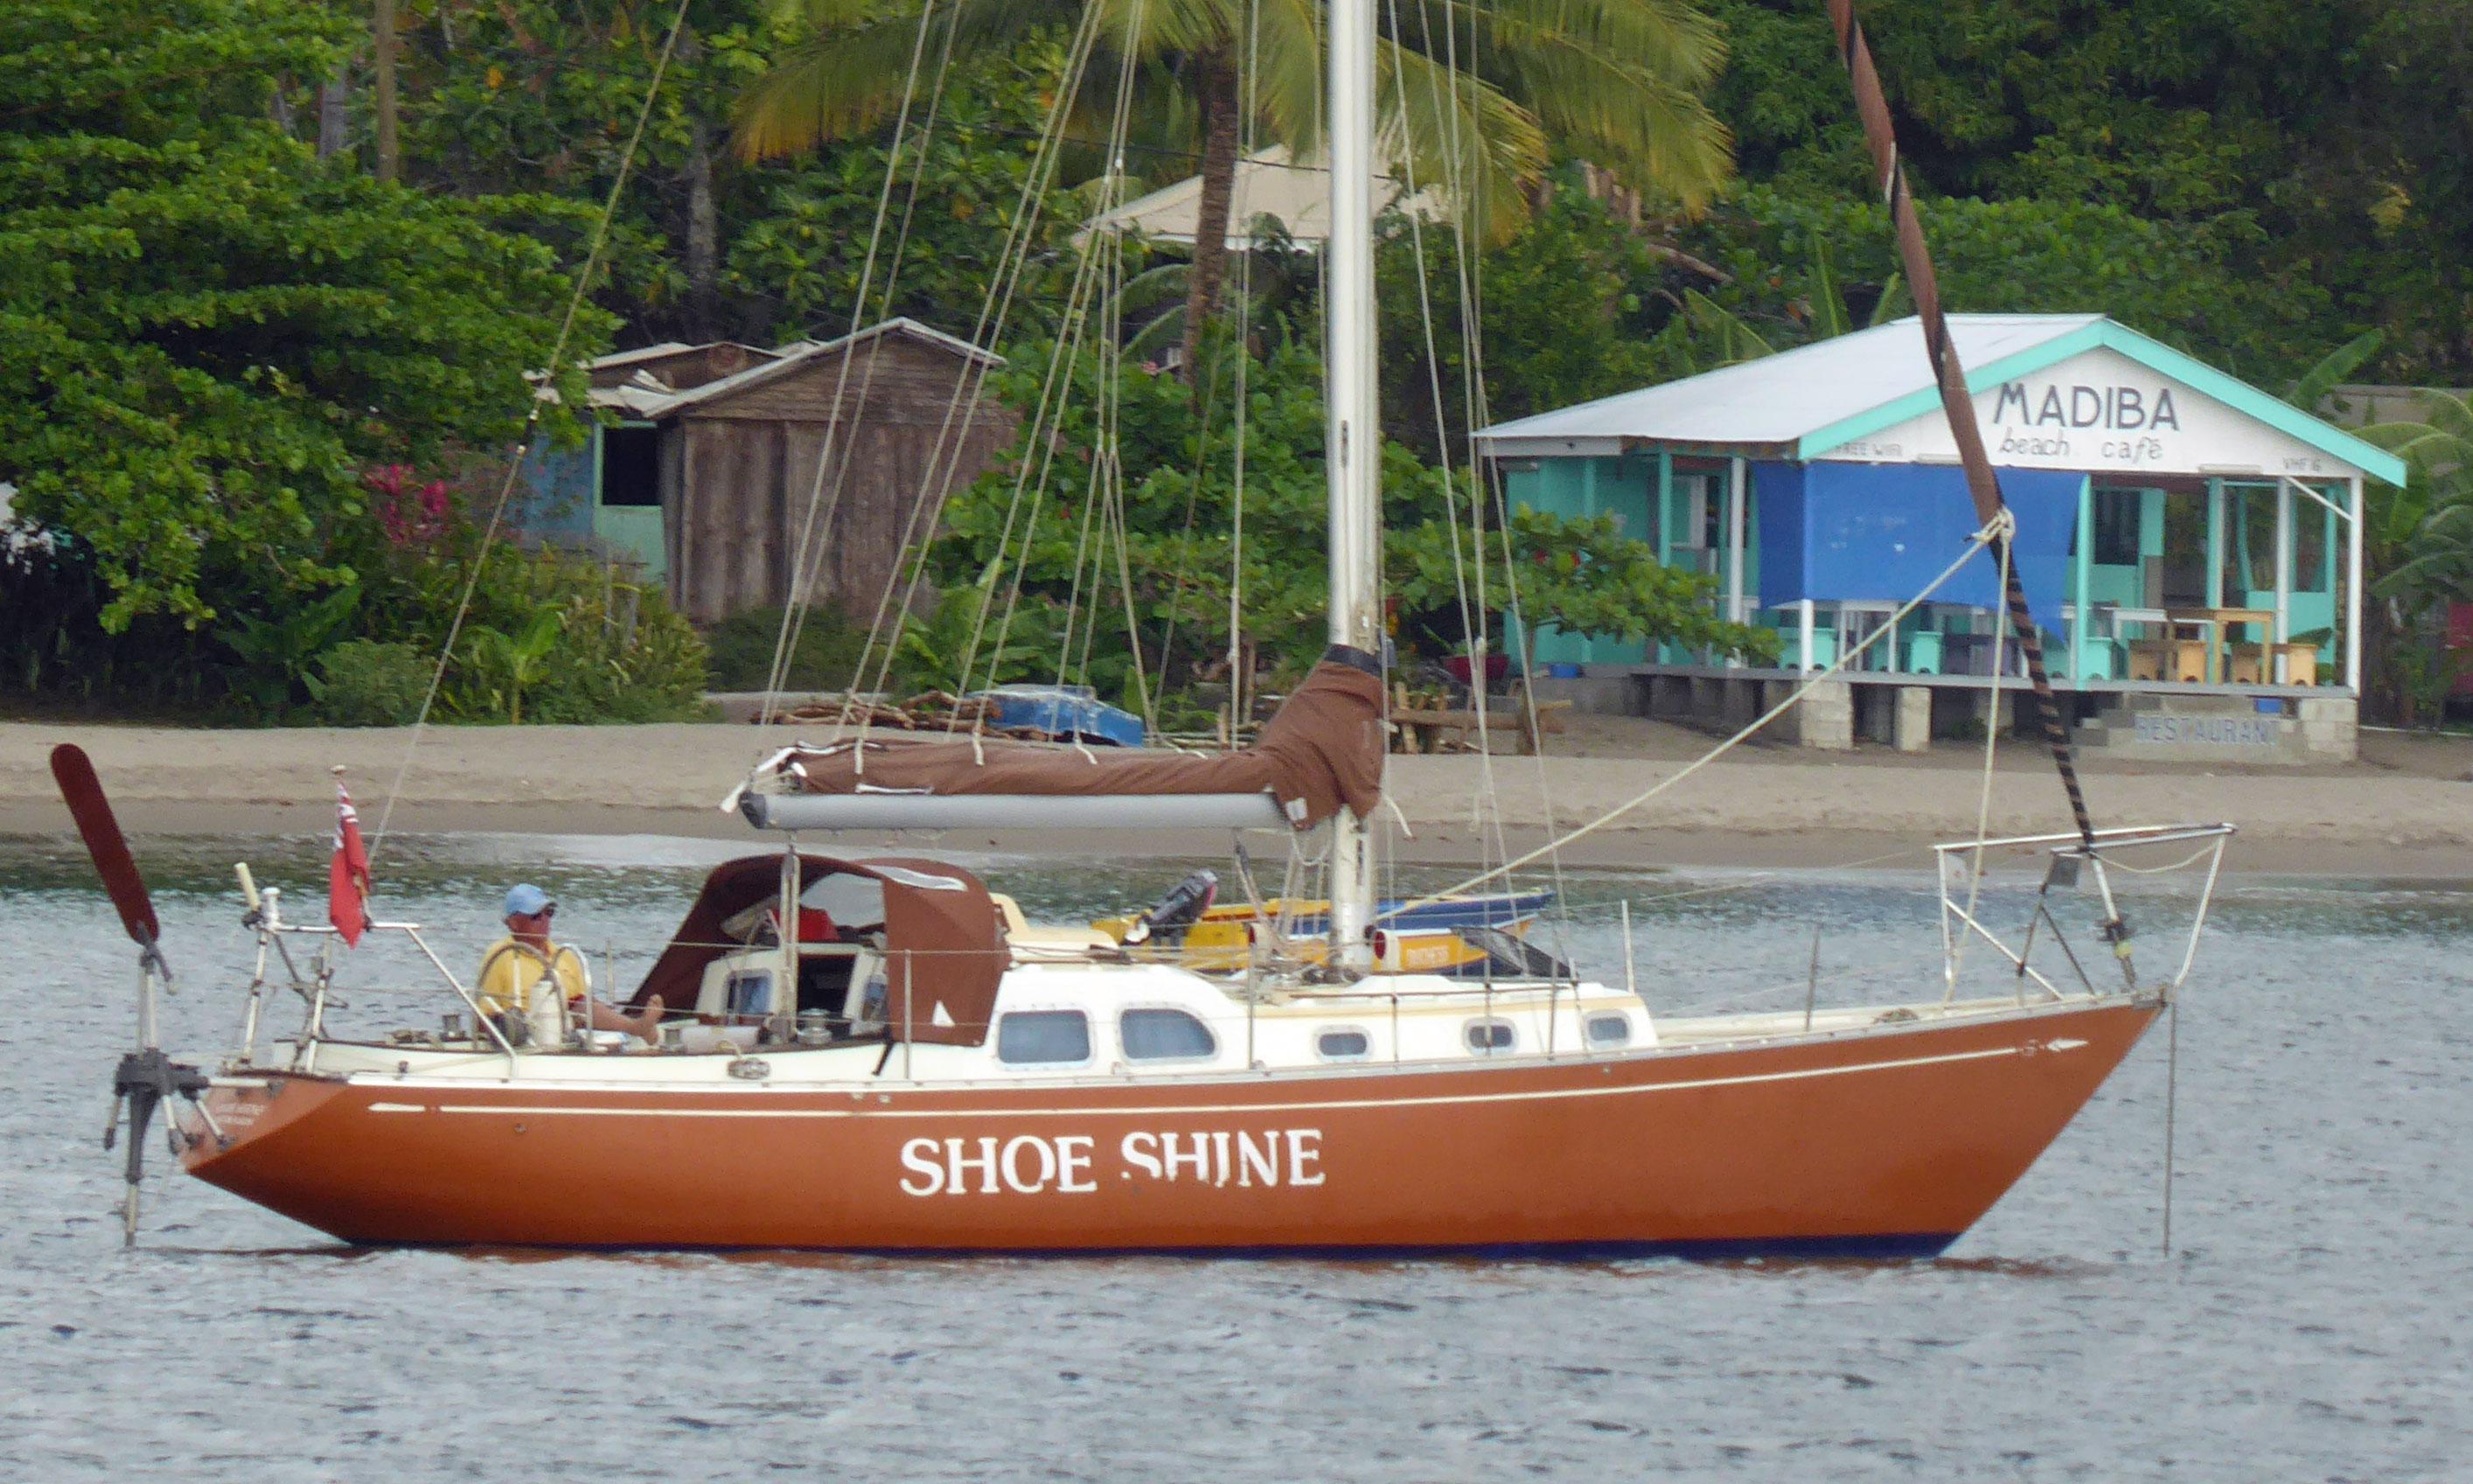 Sparkman & Stephens 34 sailboat